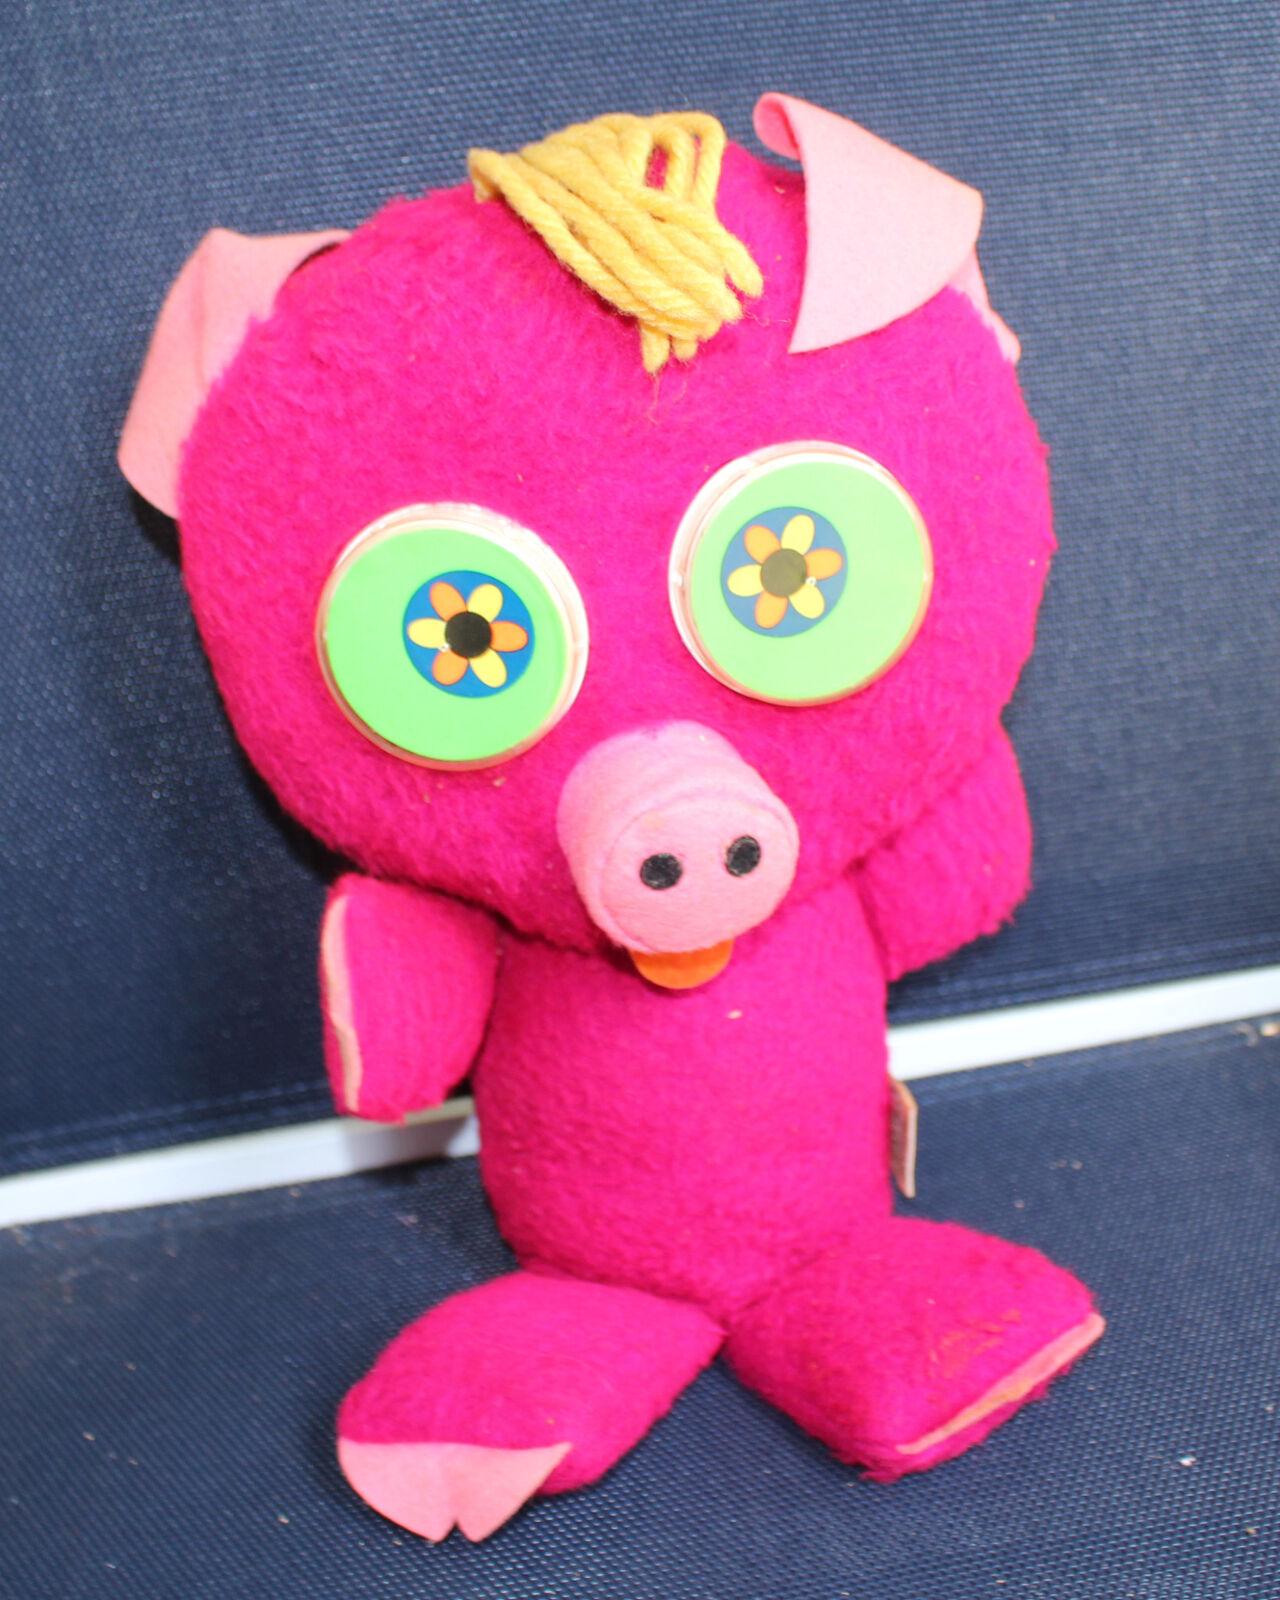 Vintage Mattel  Googlies Psychedelic Pig Hot Pink Squeaks 1967